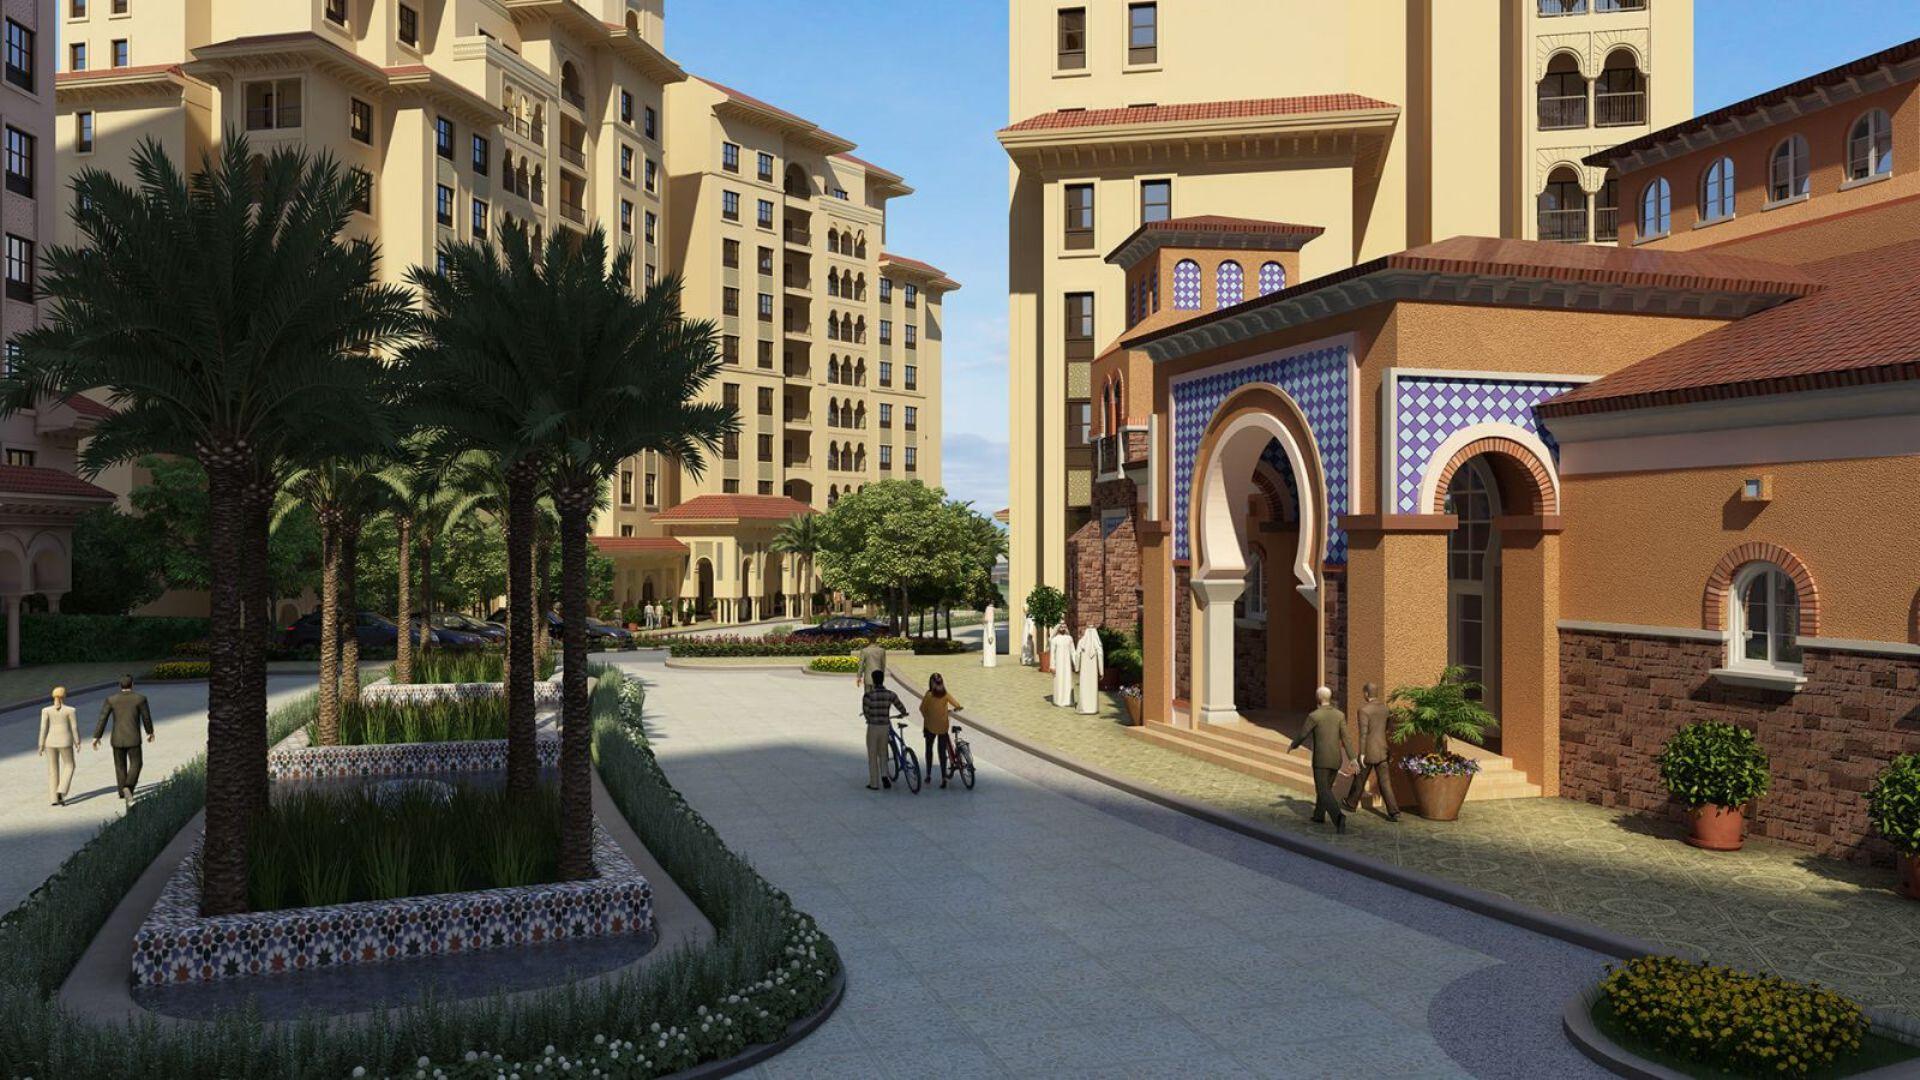 ALANDALUS, Jumeirah Golf Estates, Dubai, UAE – photo 5